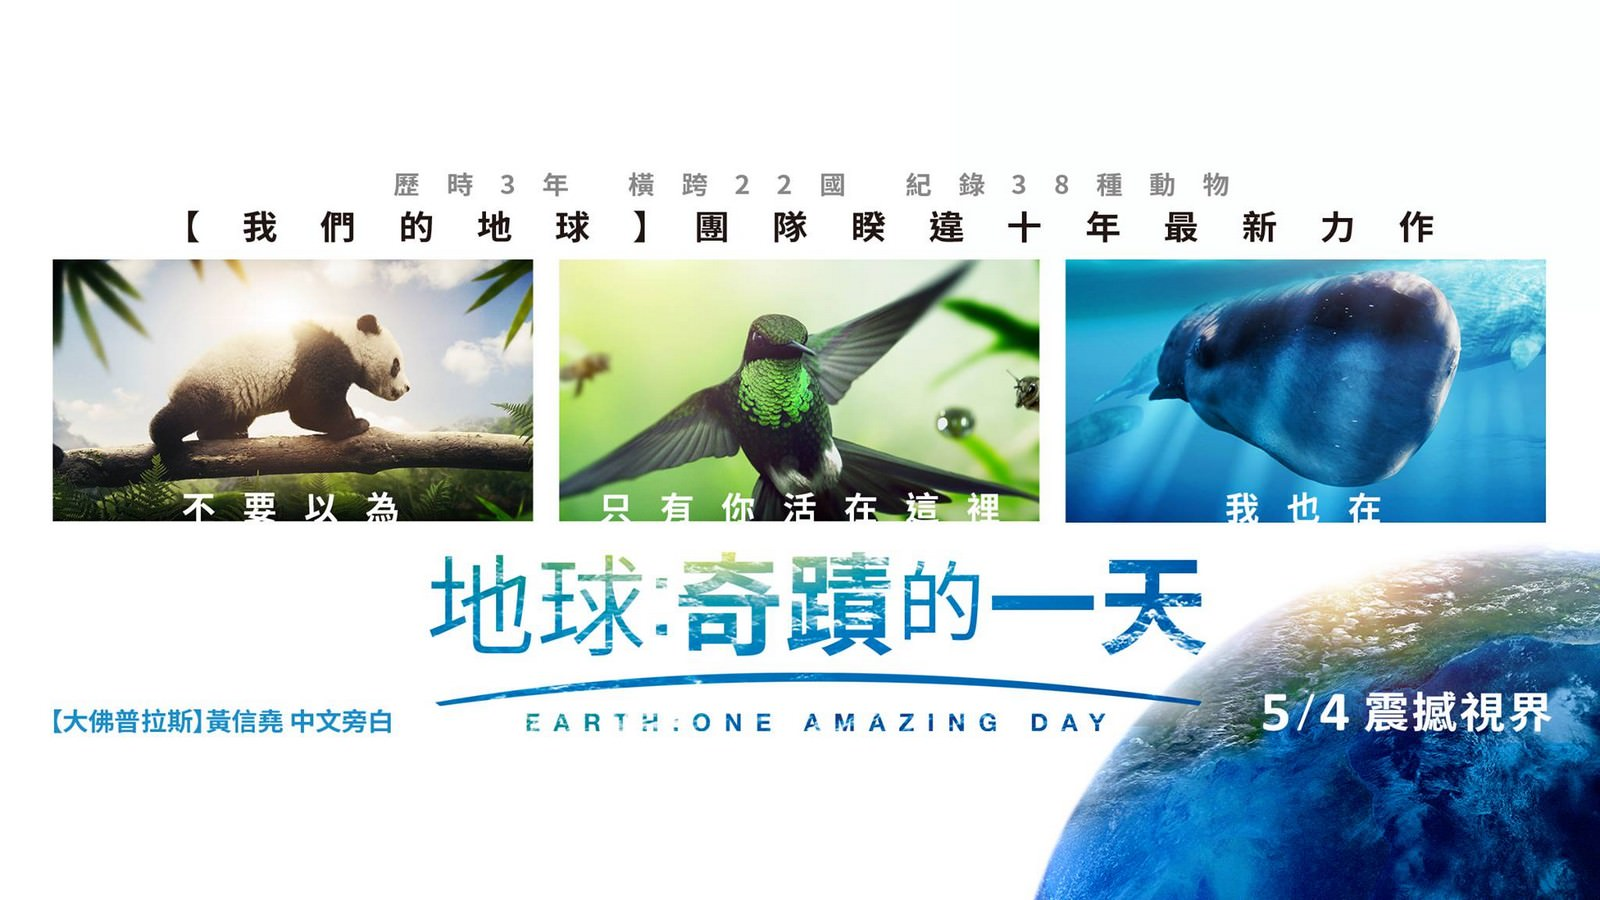 Movie, Earth: One Amazing Day(中國.英國) / 地球:奇蹟的一天(台) / 地球:神奇的一天(中), 電影海報, 台灣, 橫版